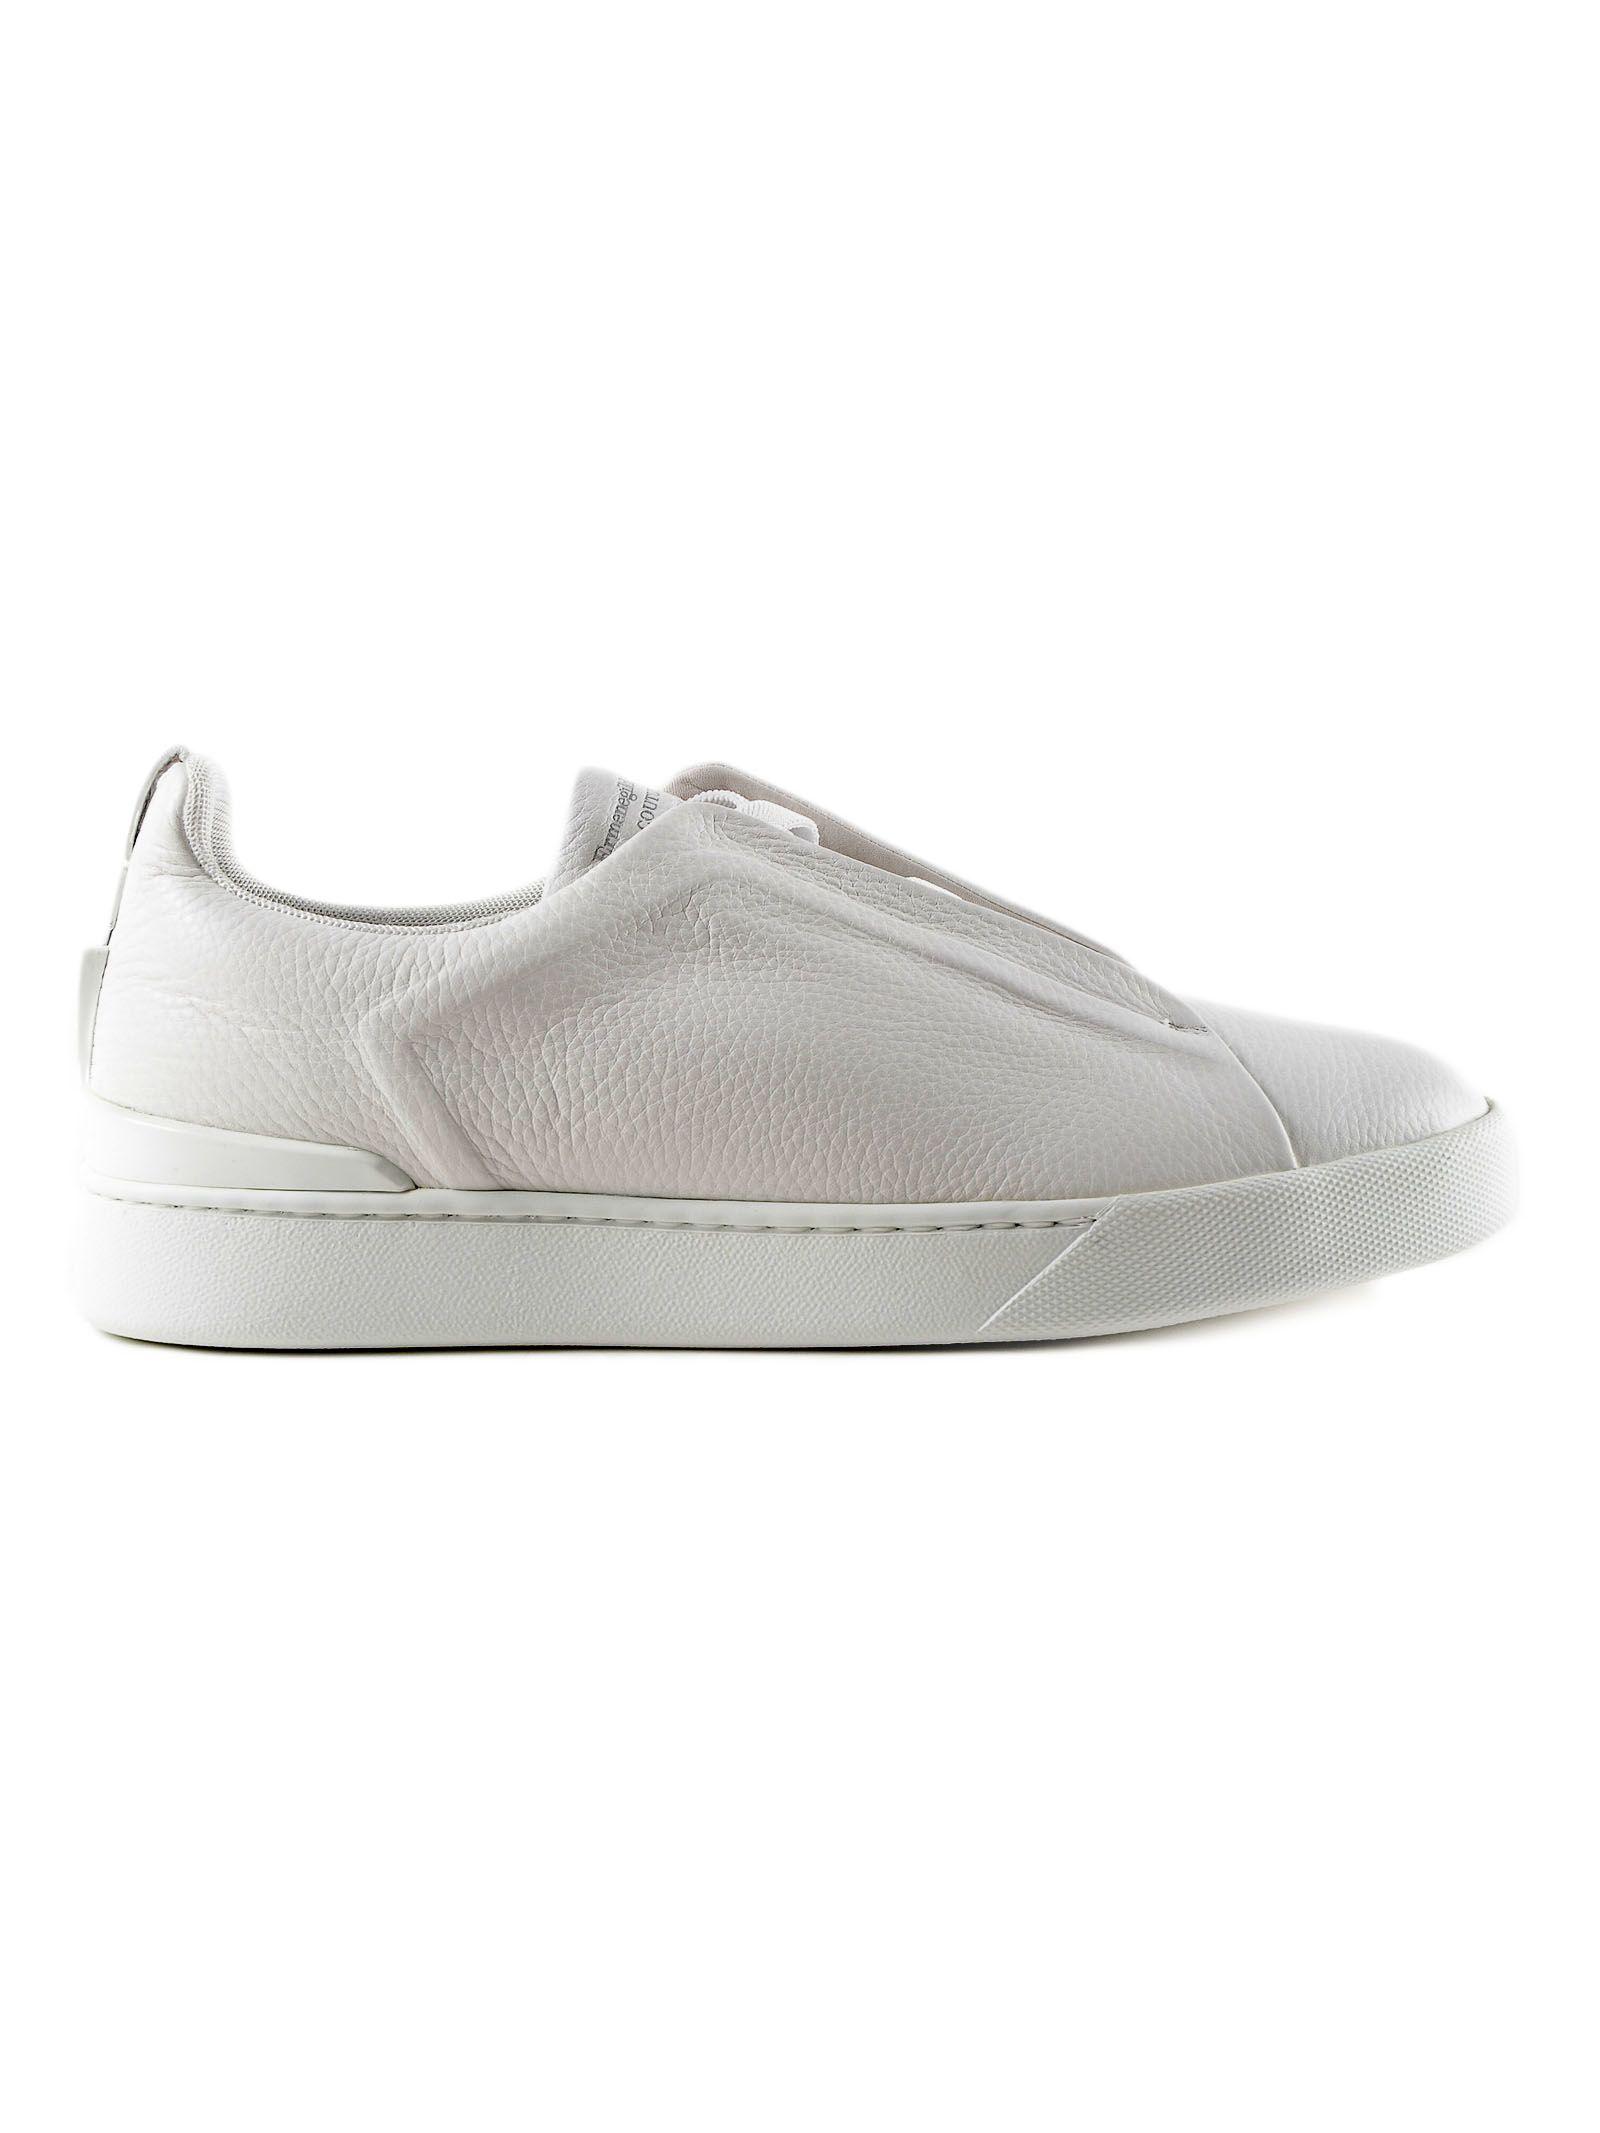 Ermenegildo Zegna Textured Slip-on Sneakers